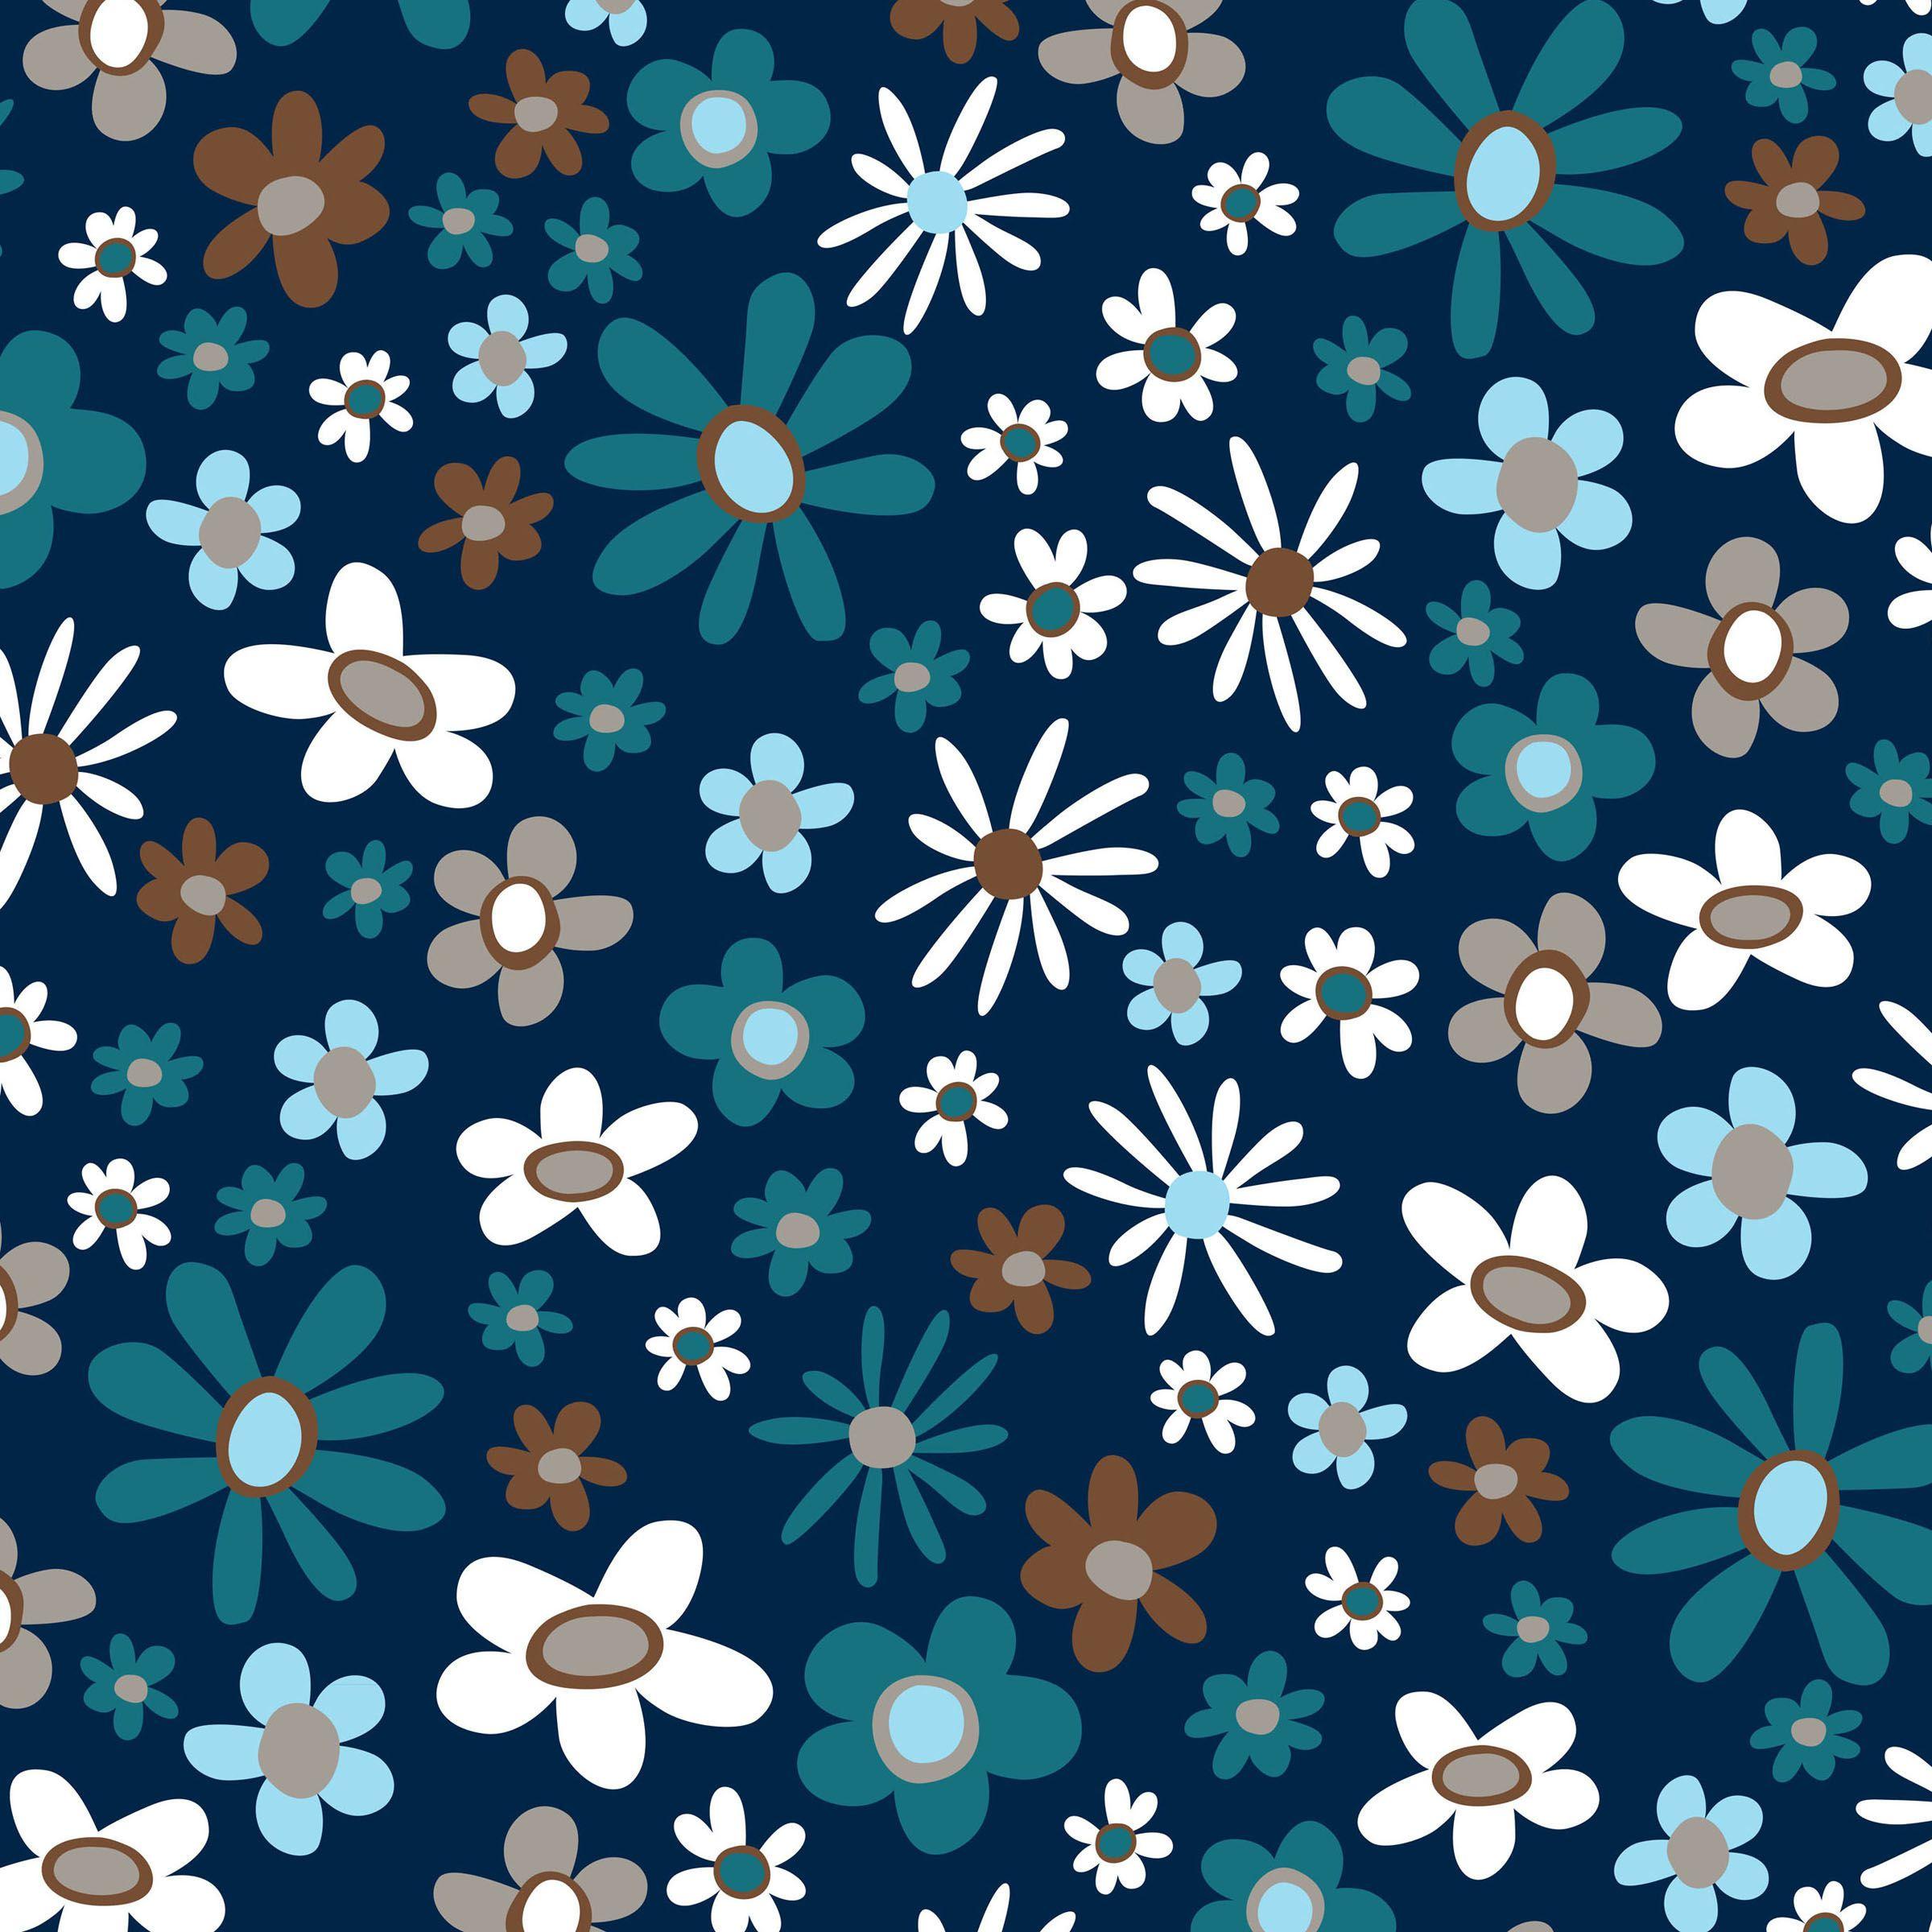 Blizzard Fleece Fabric Blue Floral Explosion Joann